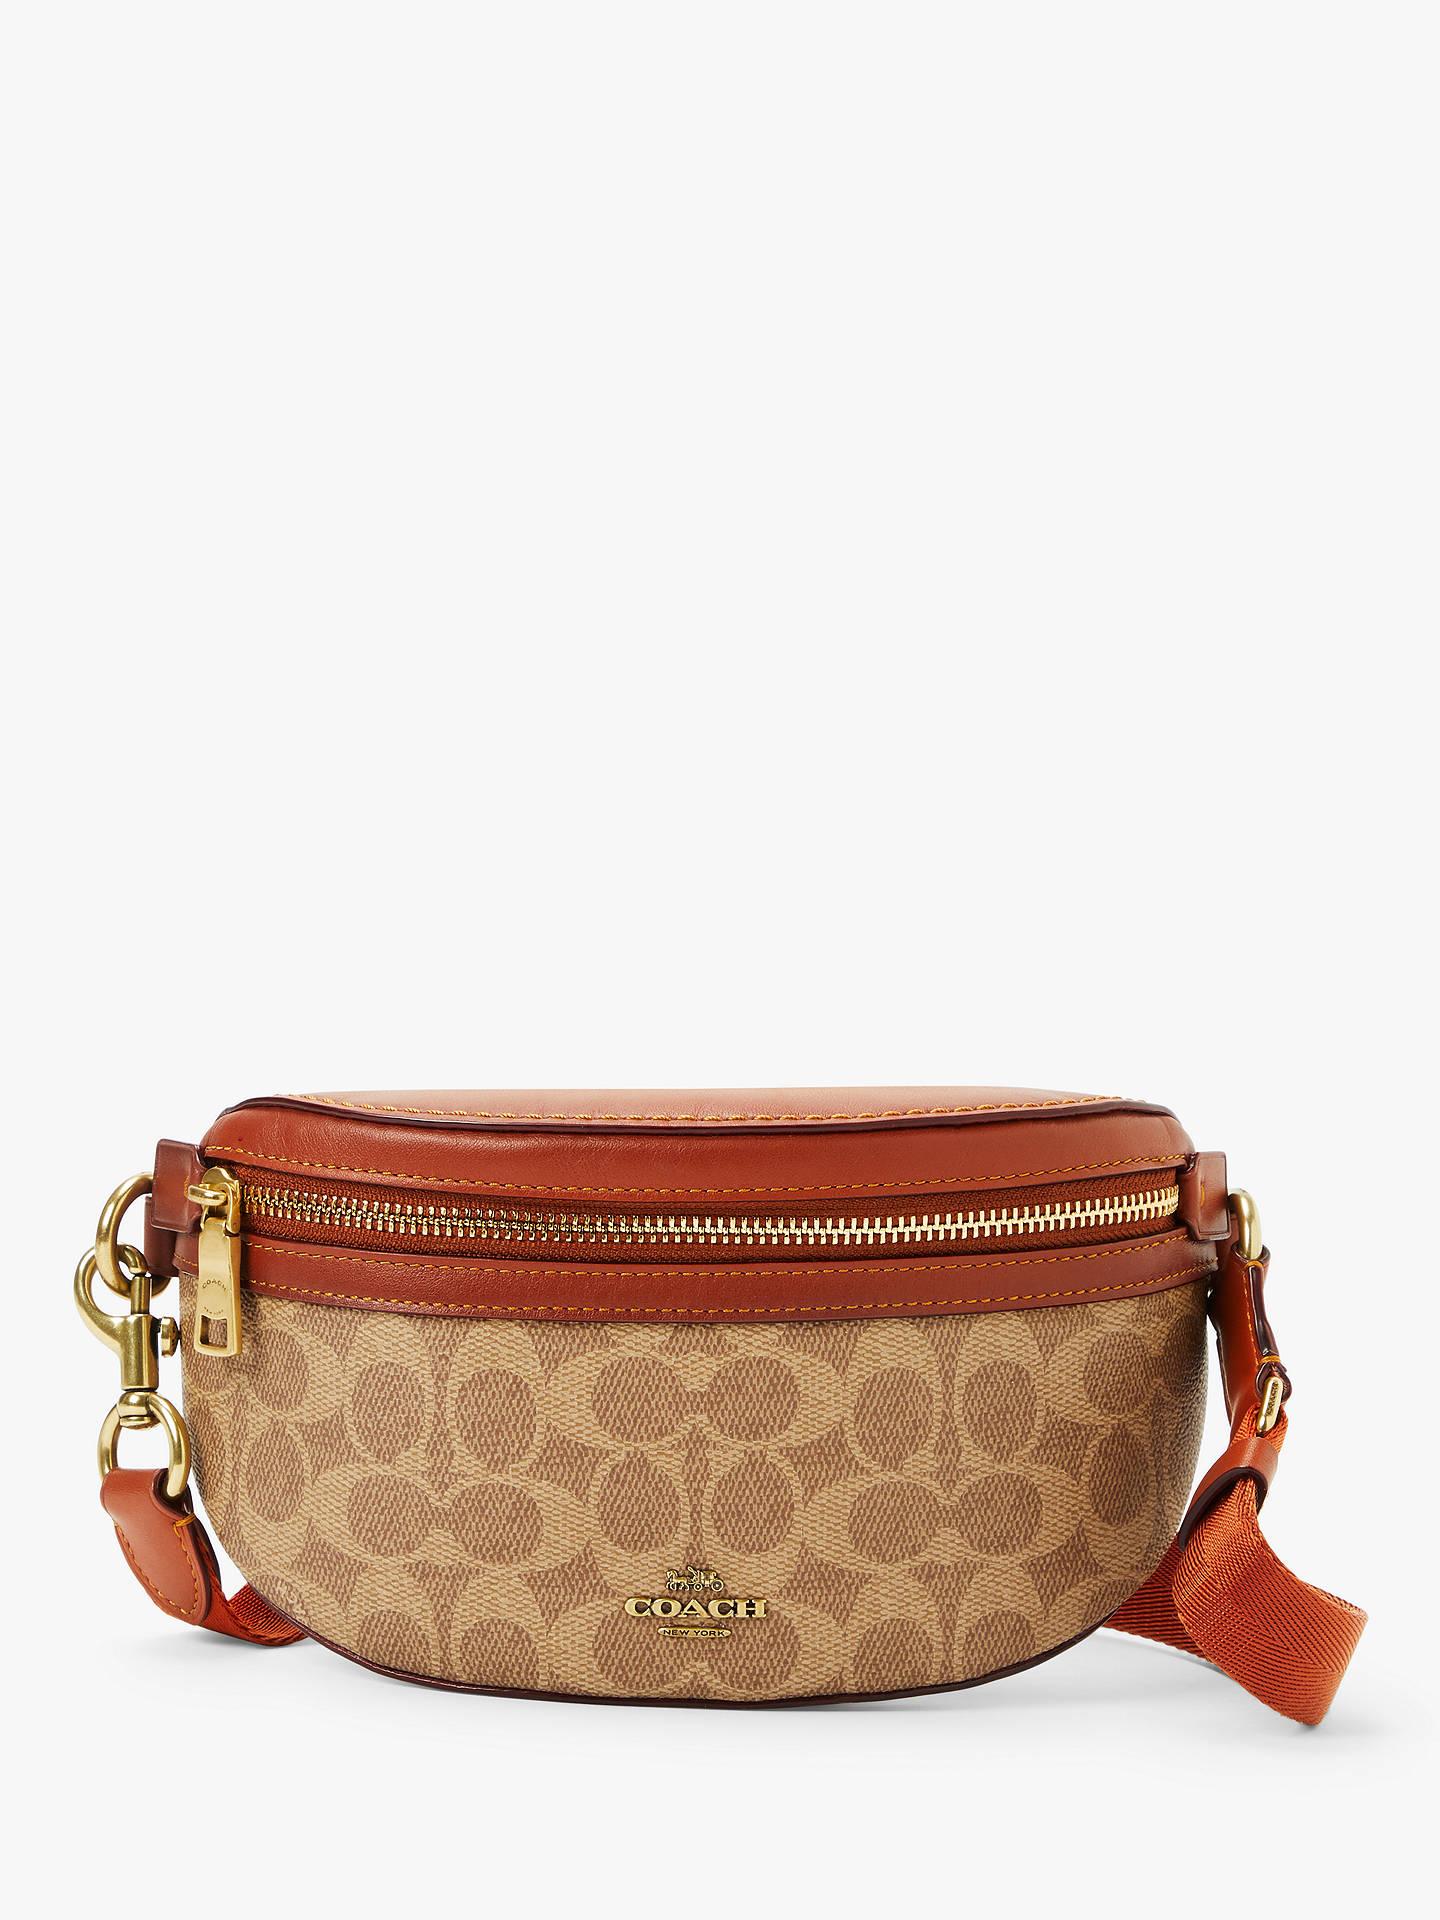 0dbd5e56 Coach Leather Signature Belt Bag, Tan/Rust